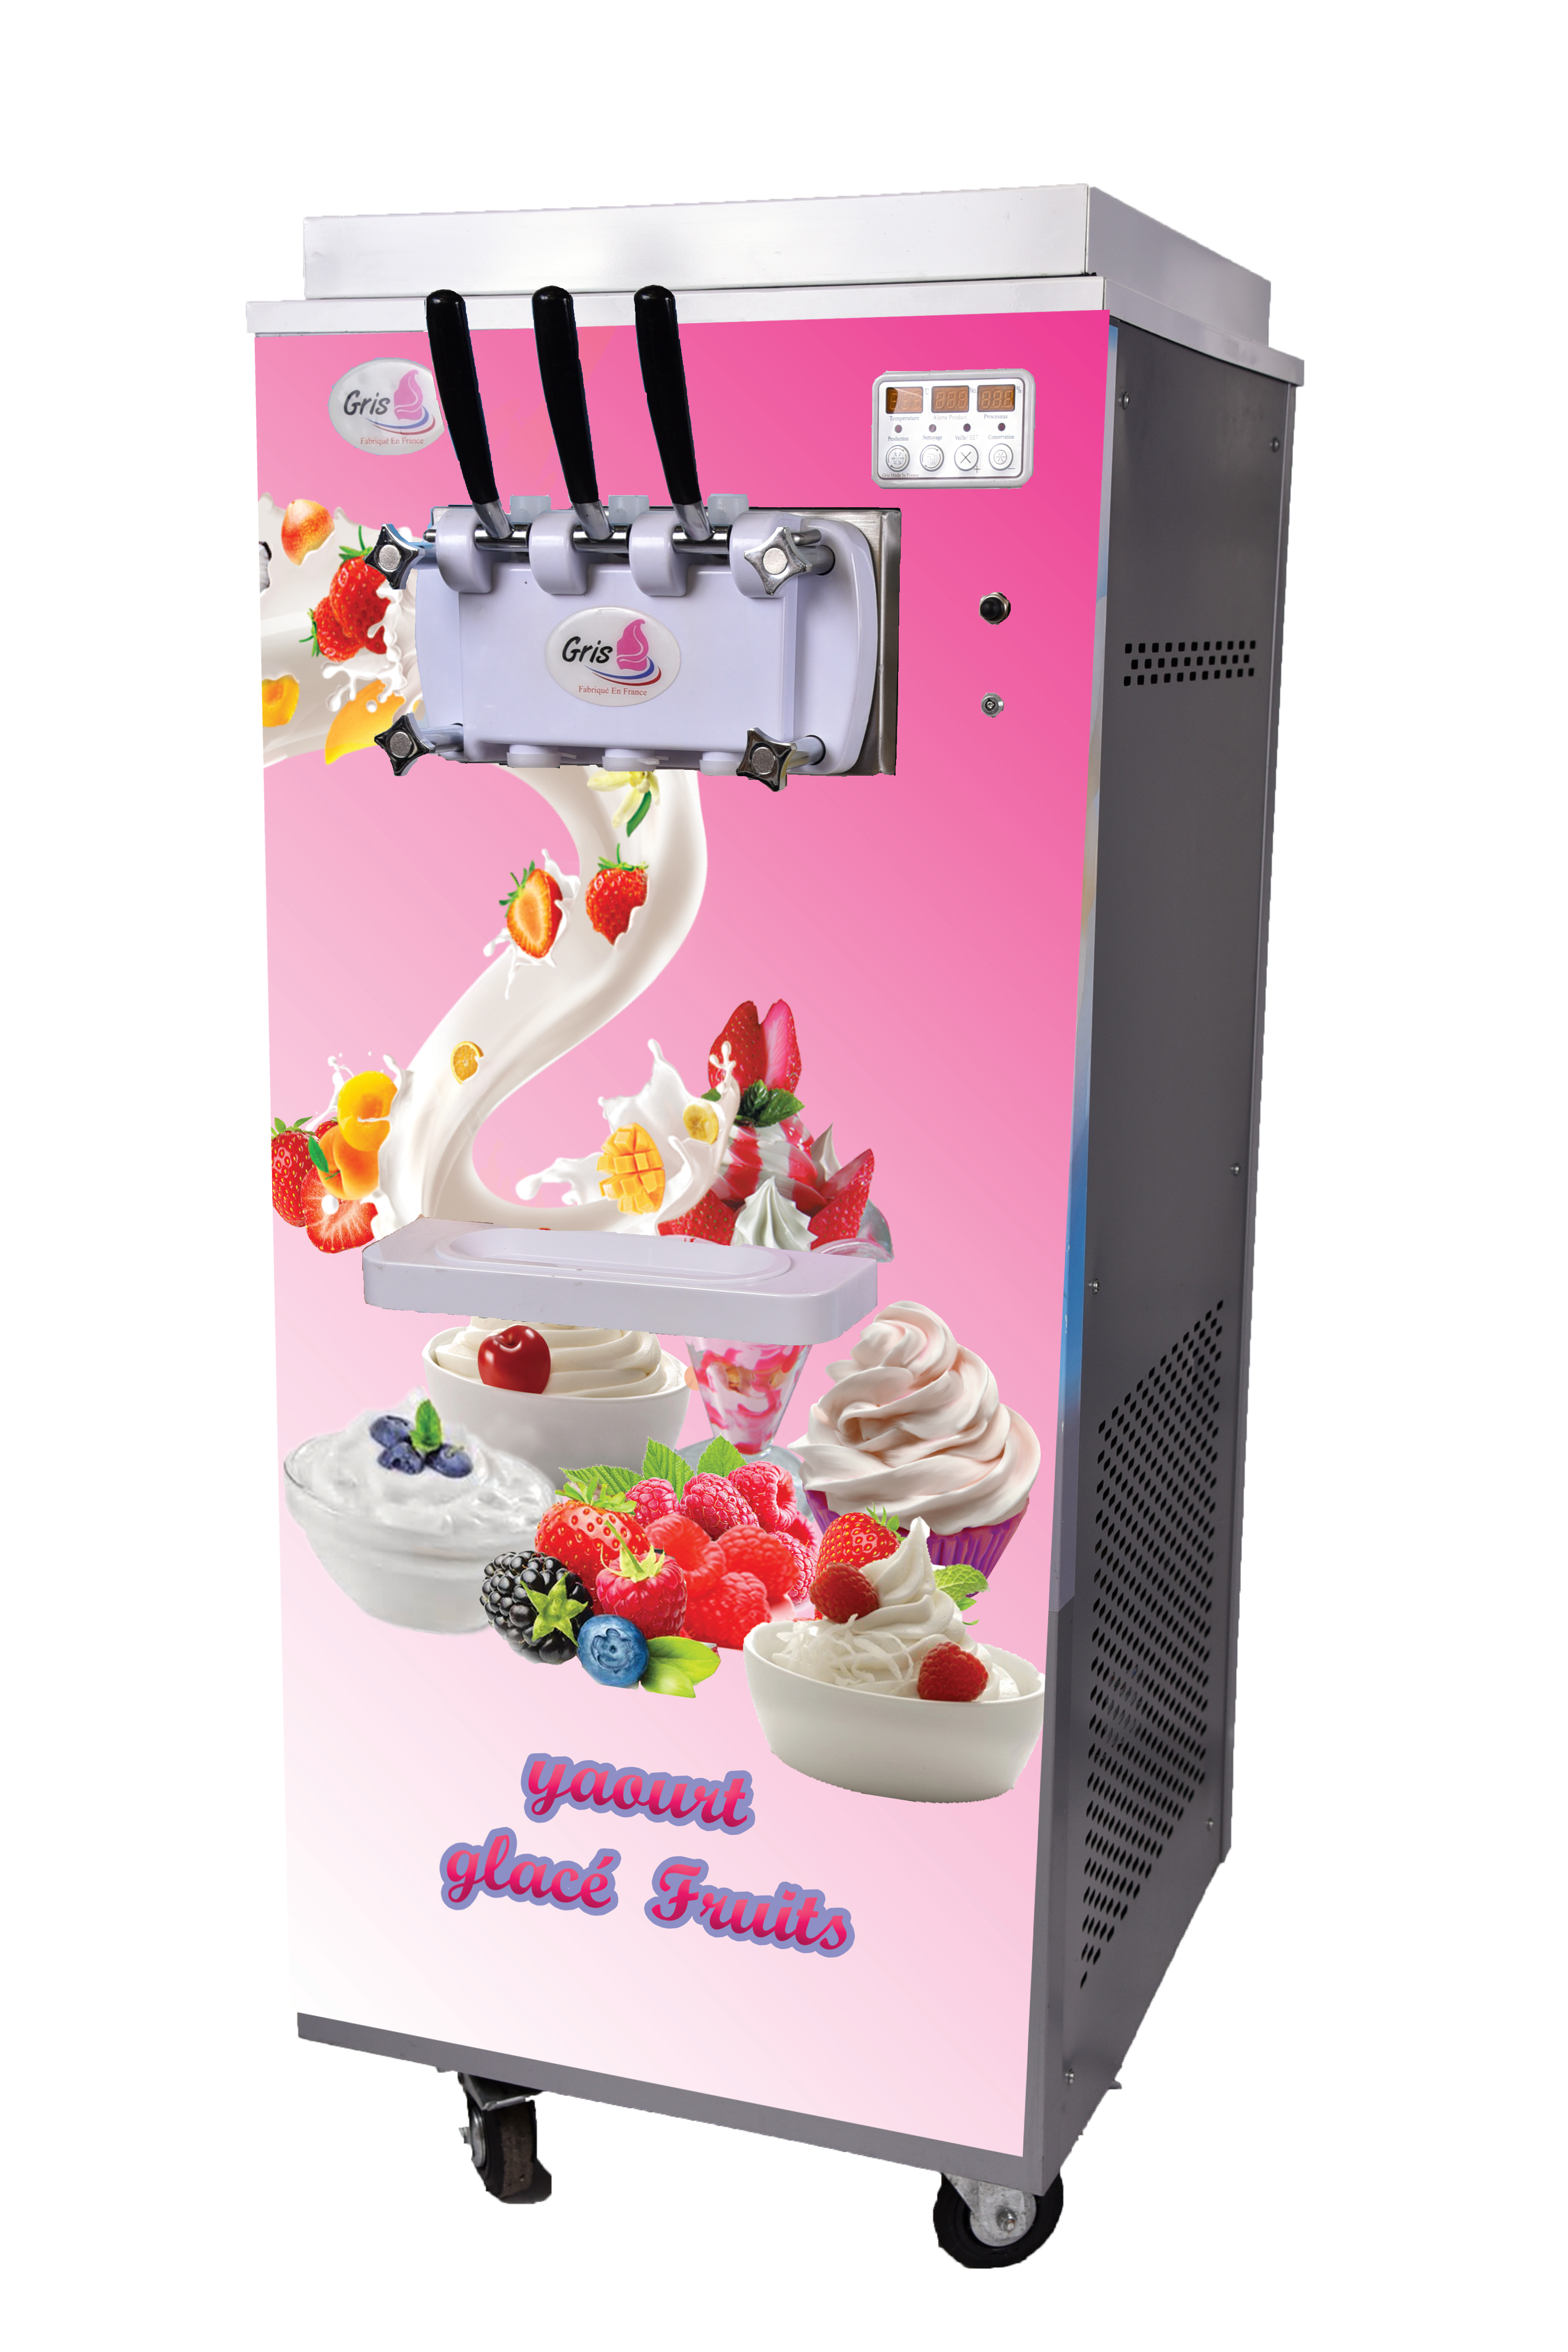 machine yaourt glac frozen yogurt la glace au yaourt. Black Bedroom Furniture Sets. Home Design Ideas